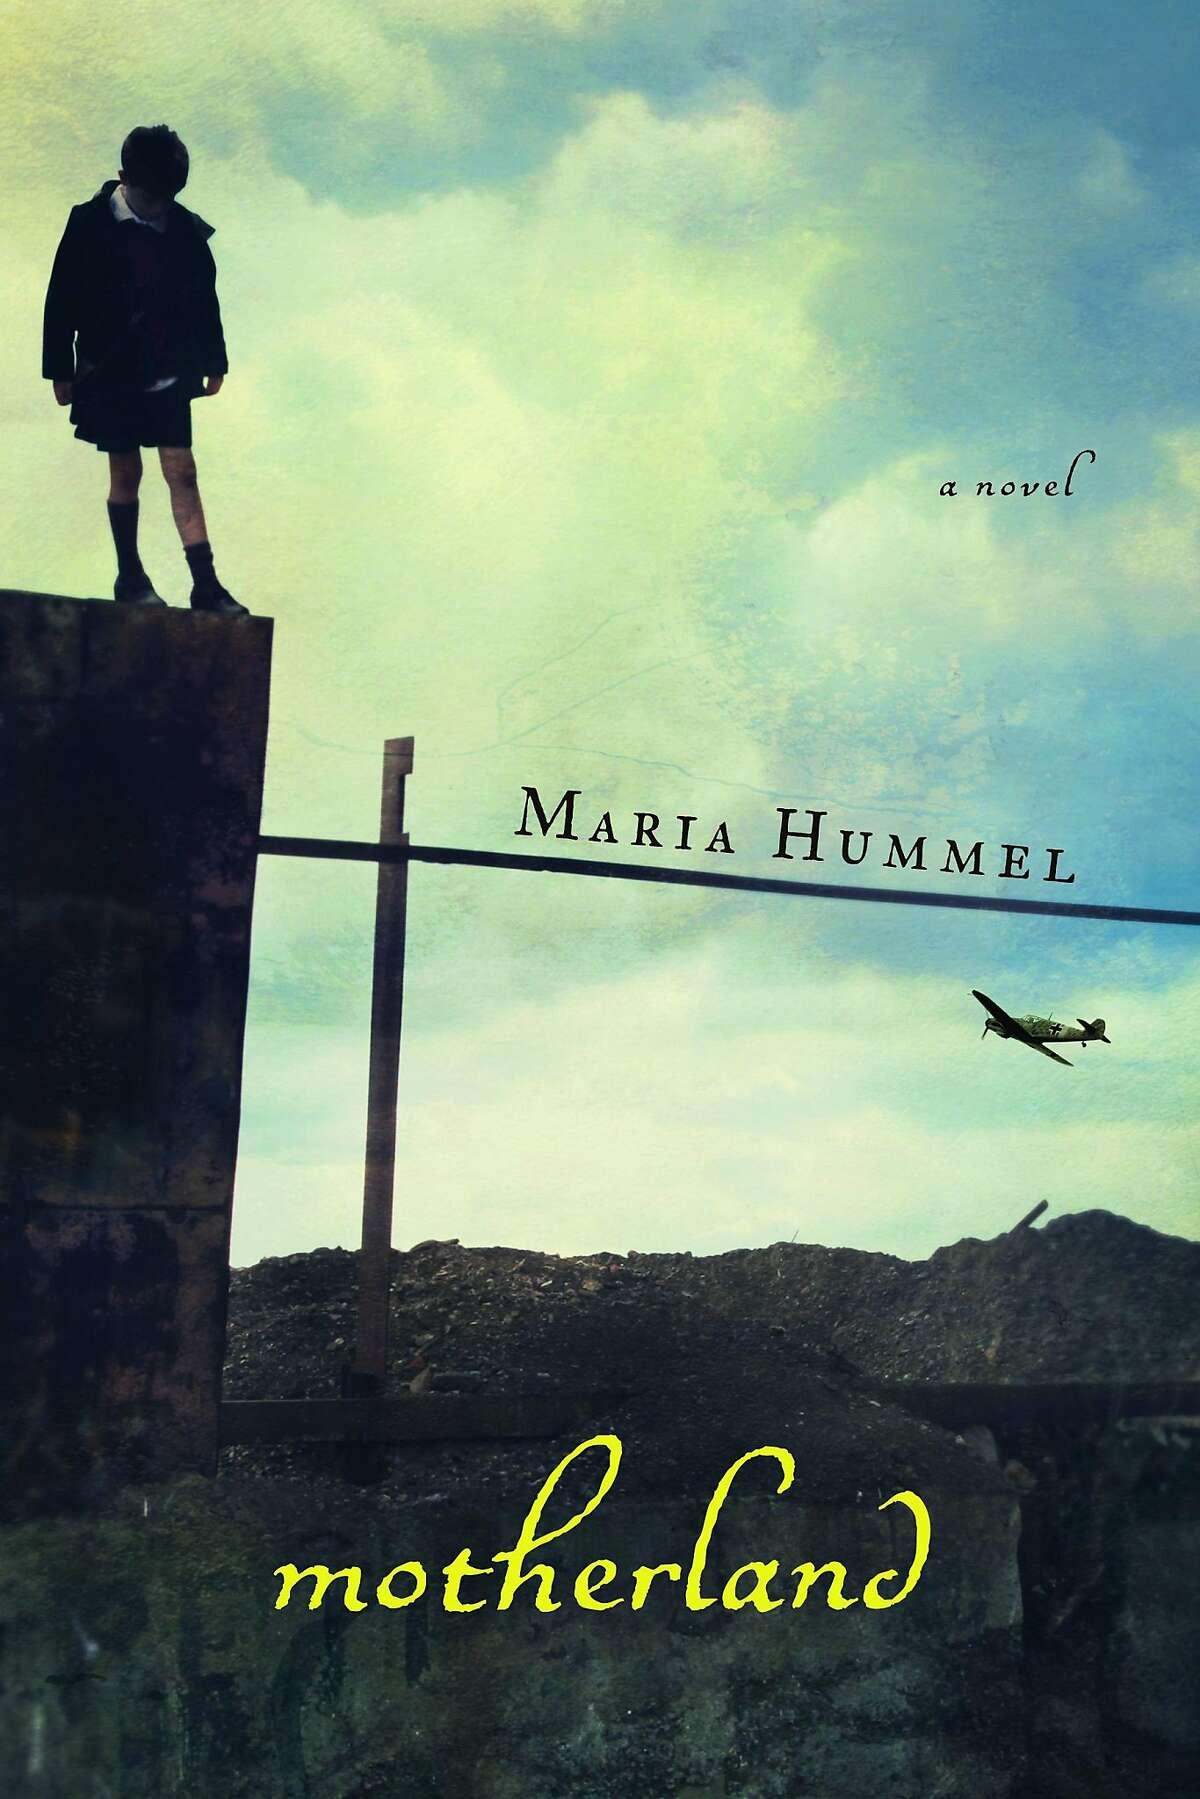 Motherland, by Maria Hummel